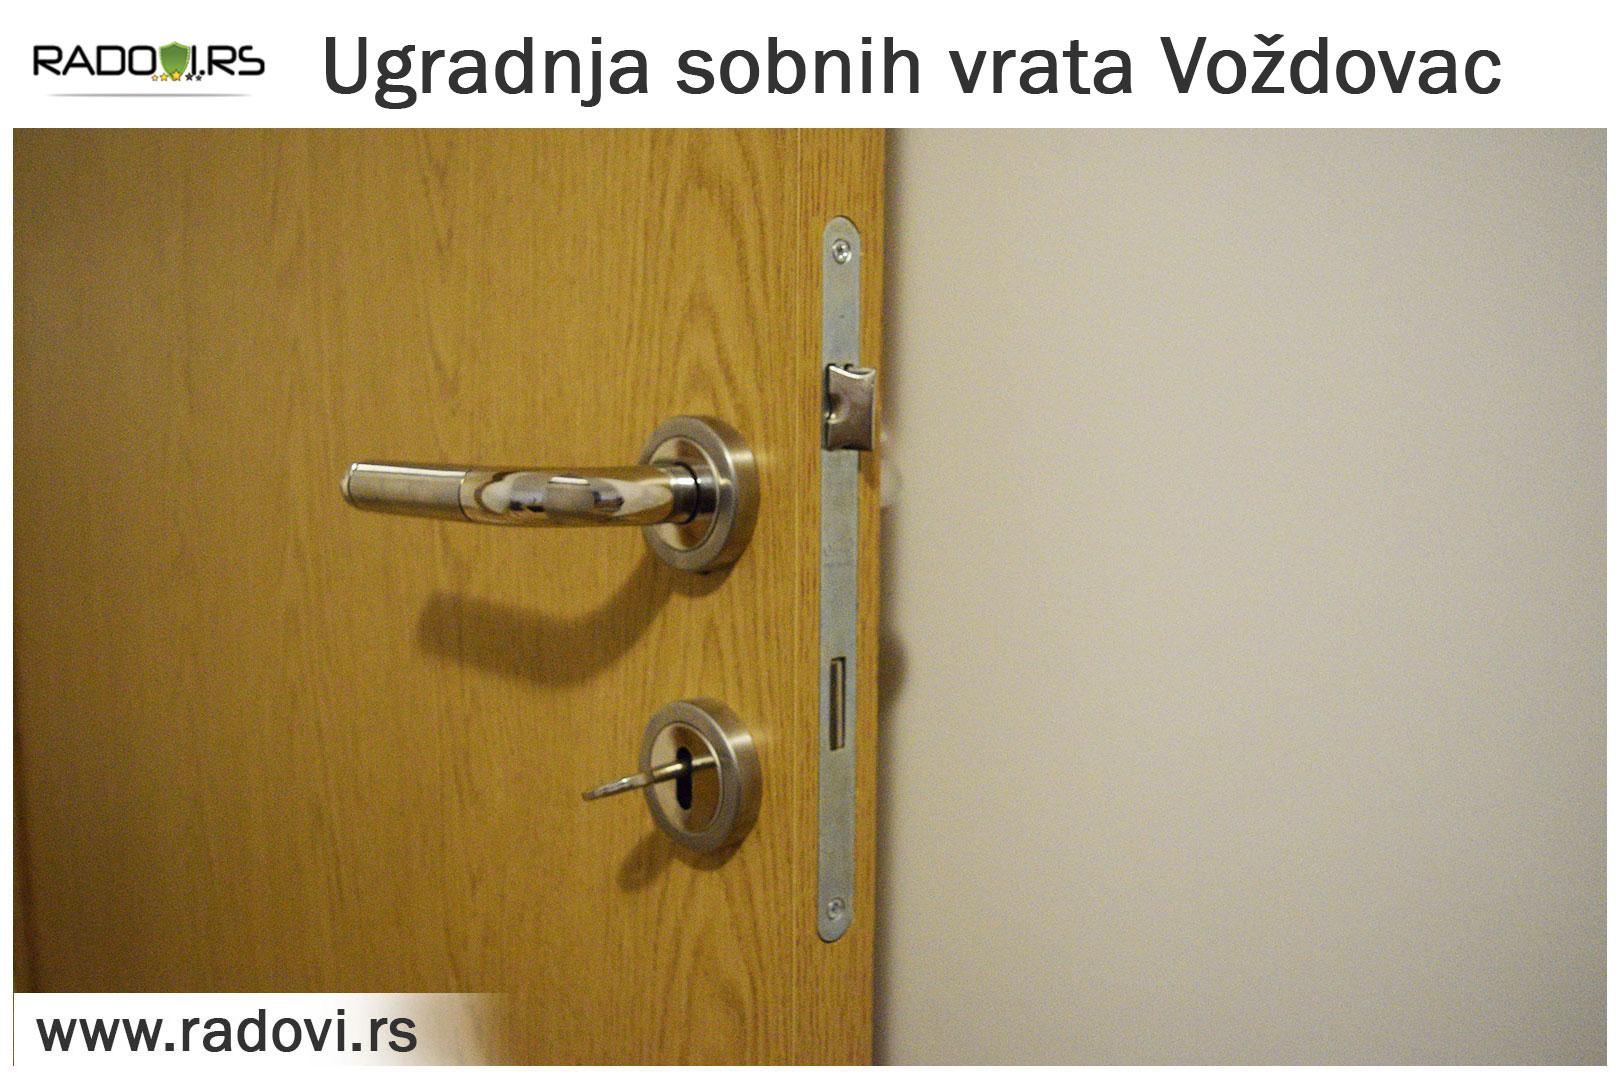 Ugradnja sobnih vrataVoždovac - PVC stolarija Tim - Radovi.rs